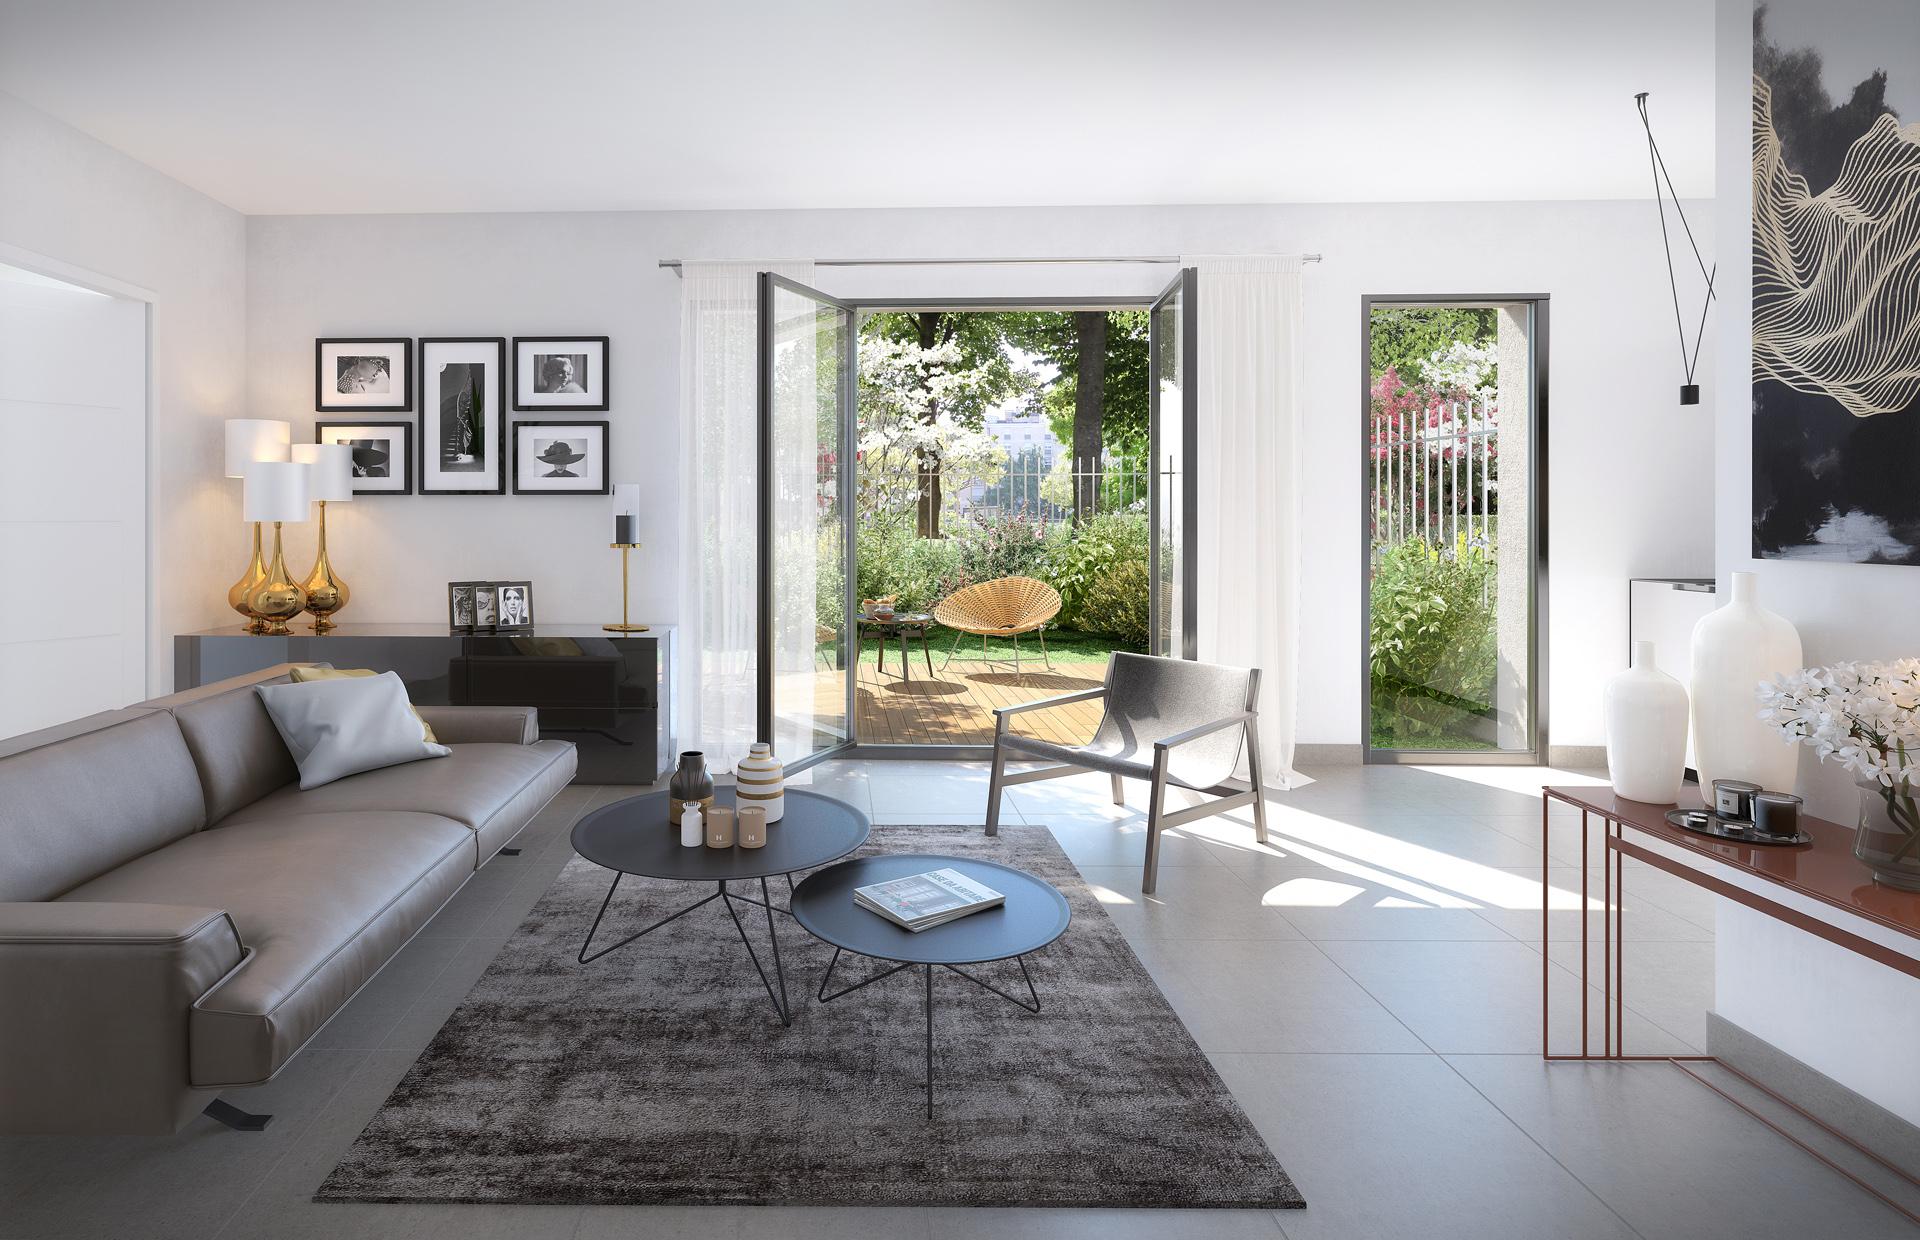 BOUYGUES-Projet Neuilly Paris 12e-nterieur A1001mdf2_full